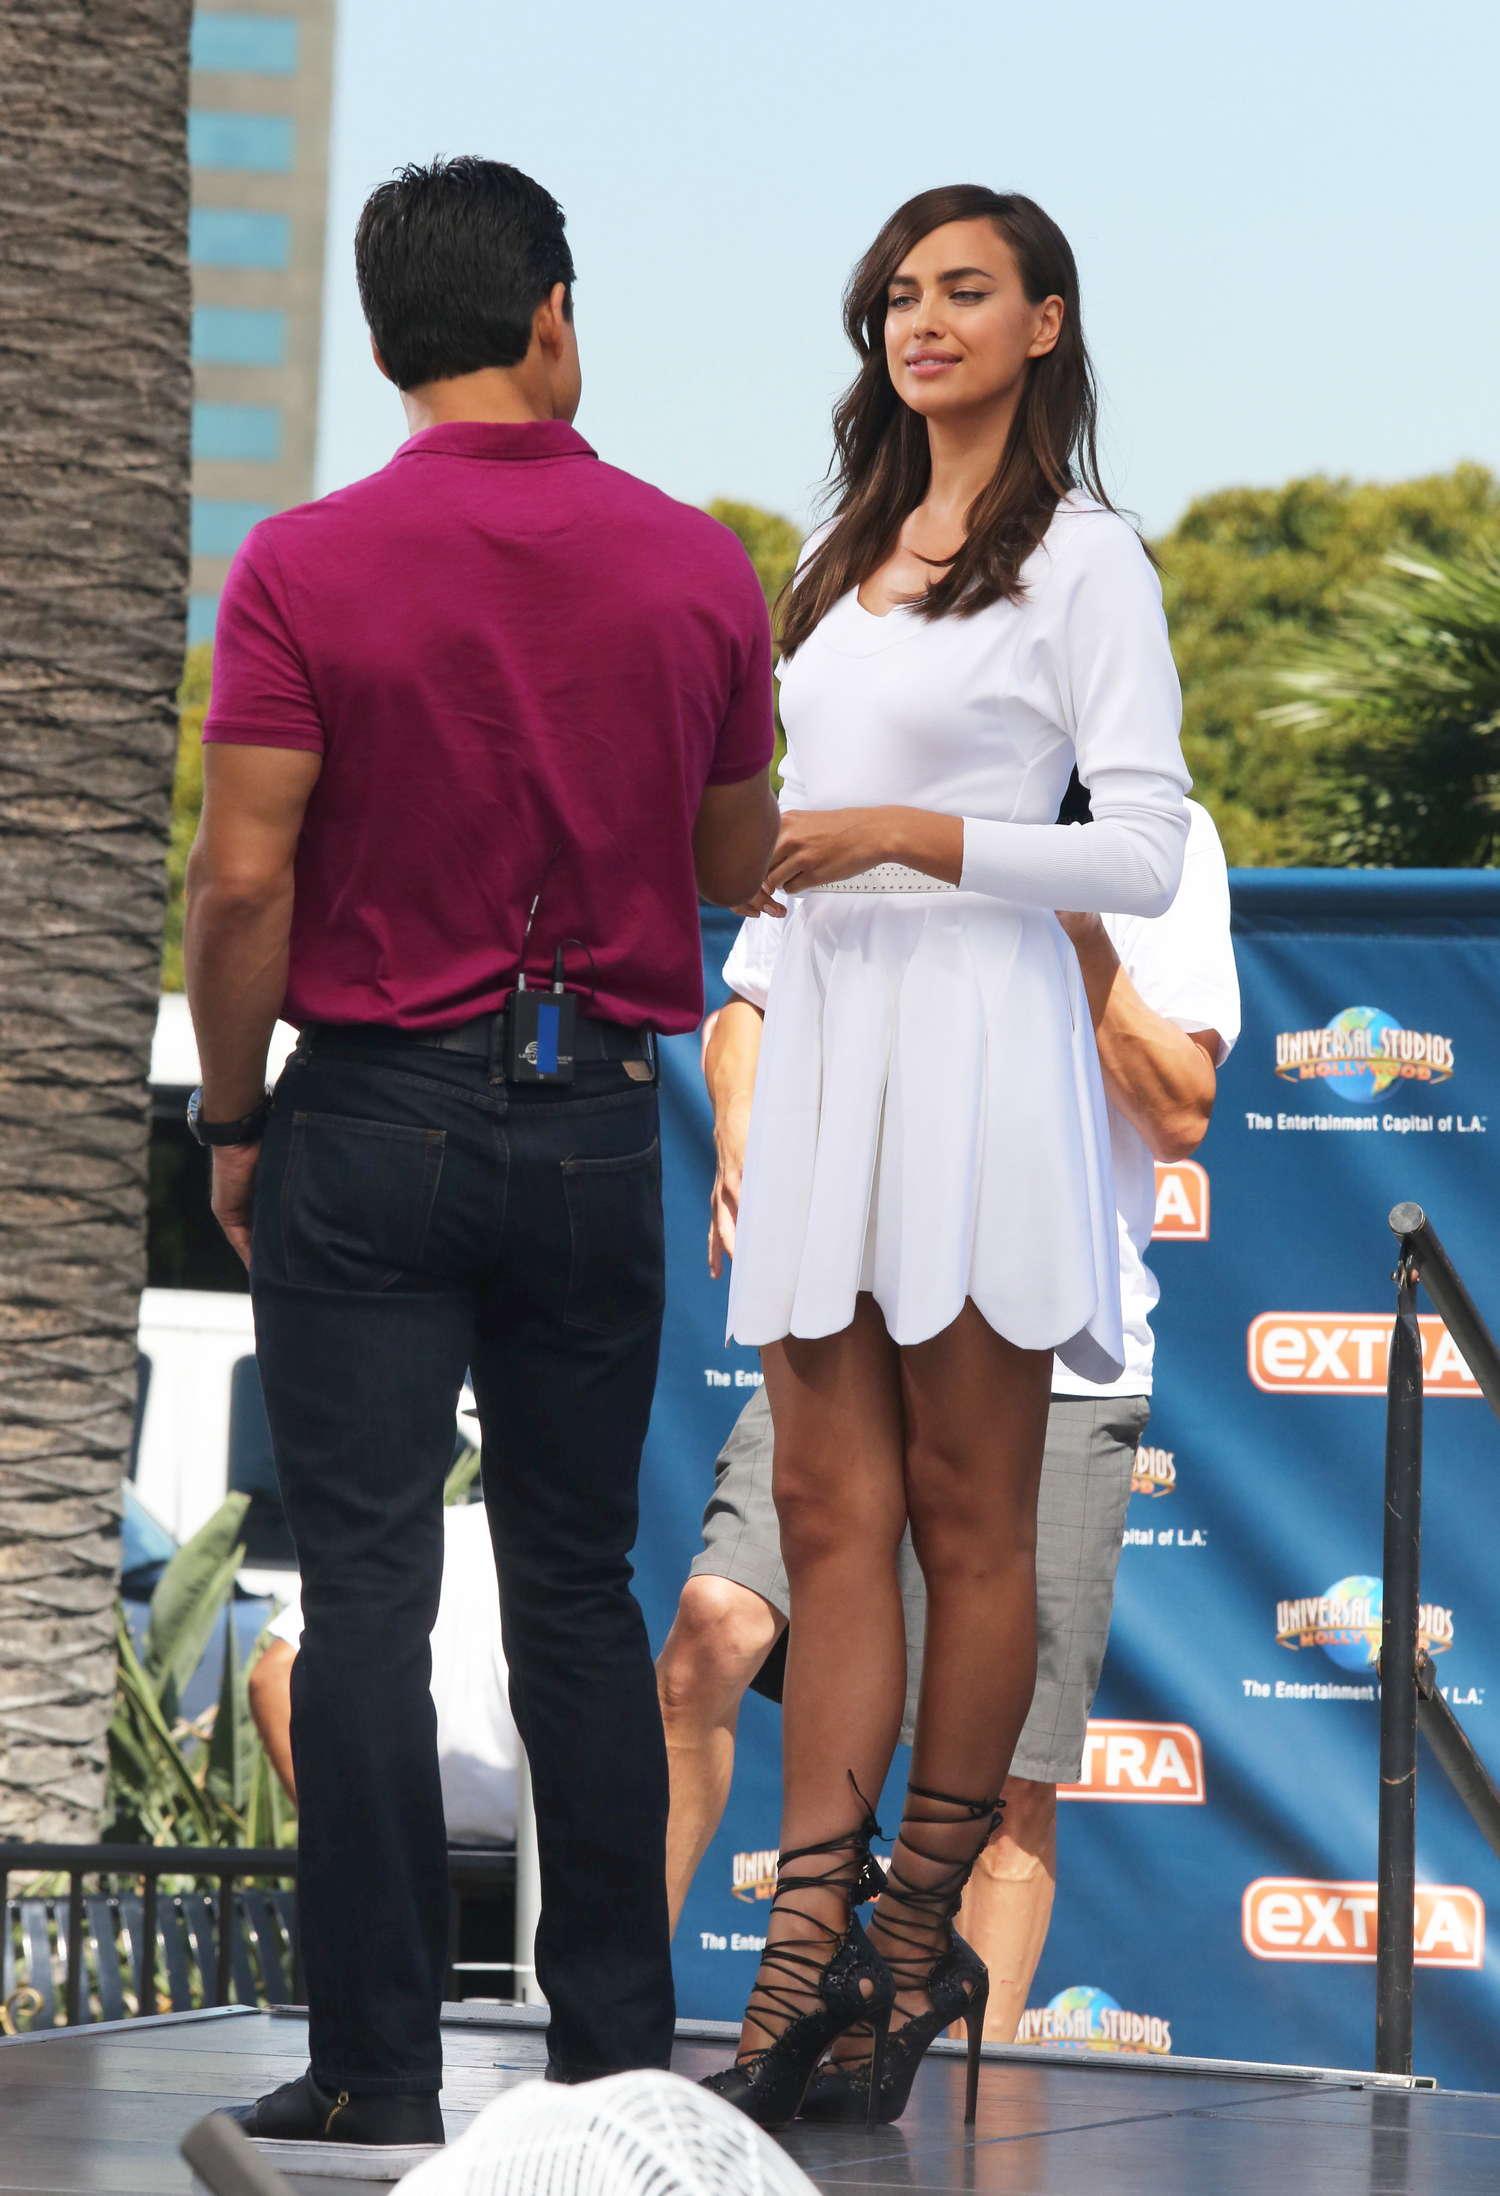 Irina Shayk 2014 : Irina Shayk in White Dress on Extra Set -48